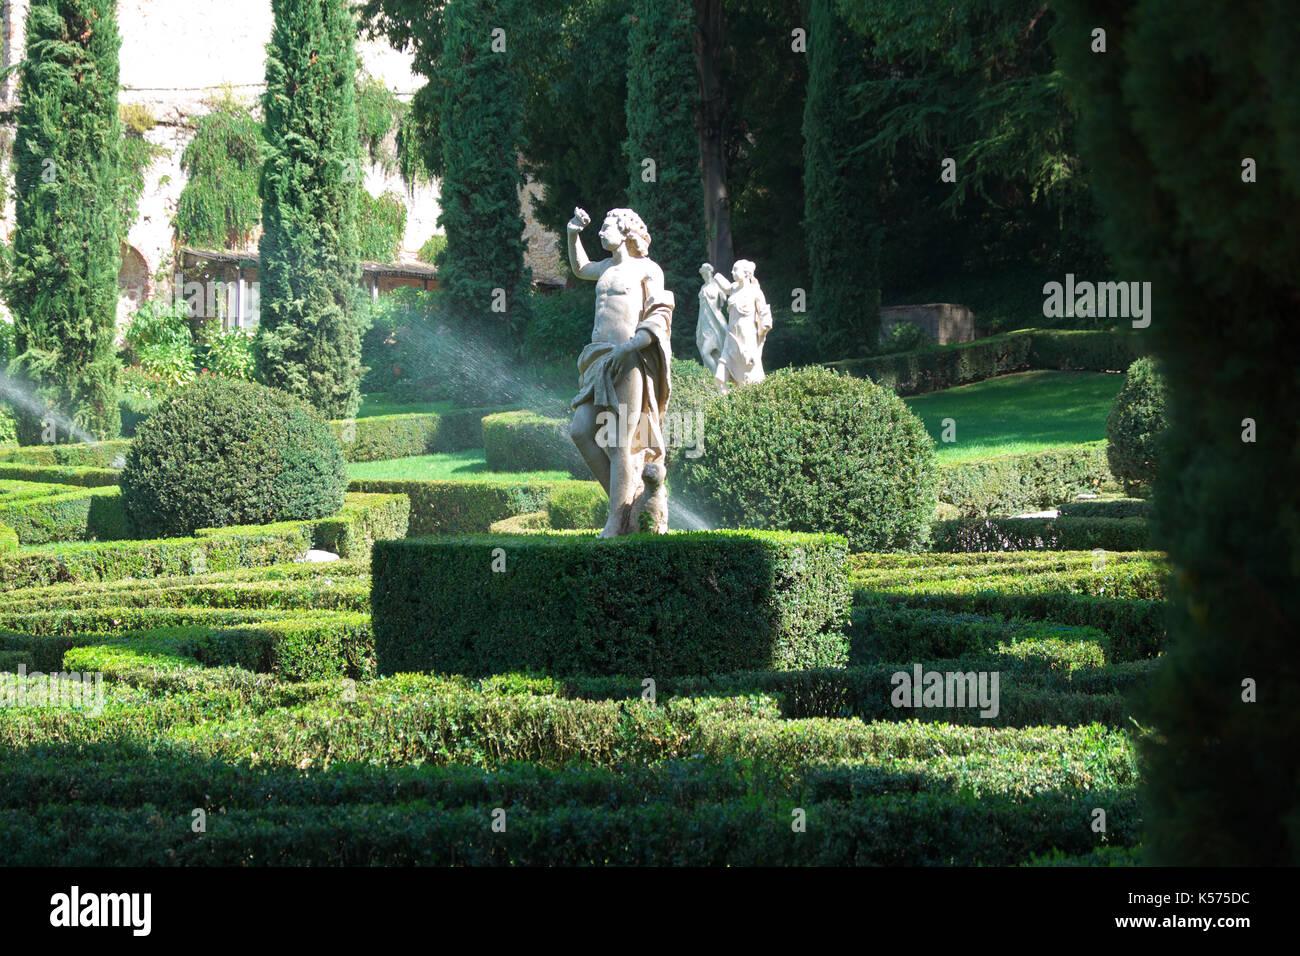 Verona italy the giardino giusti statues in the ornate gardens